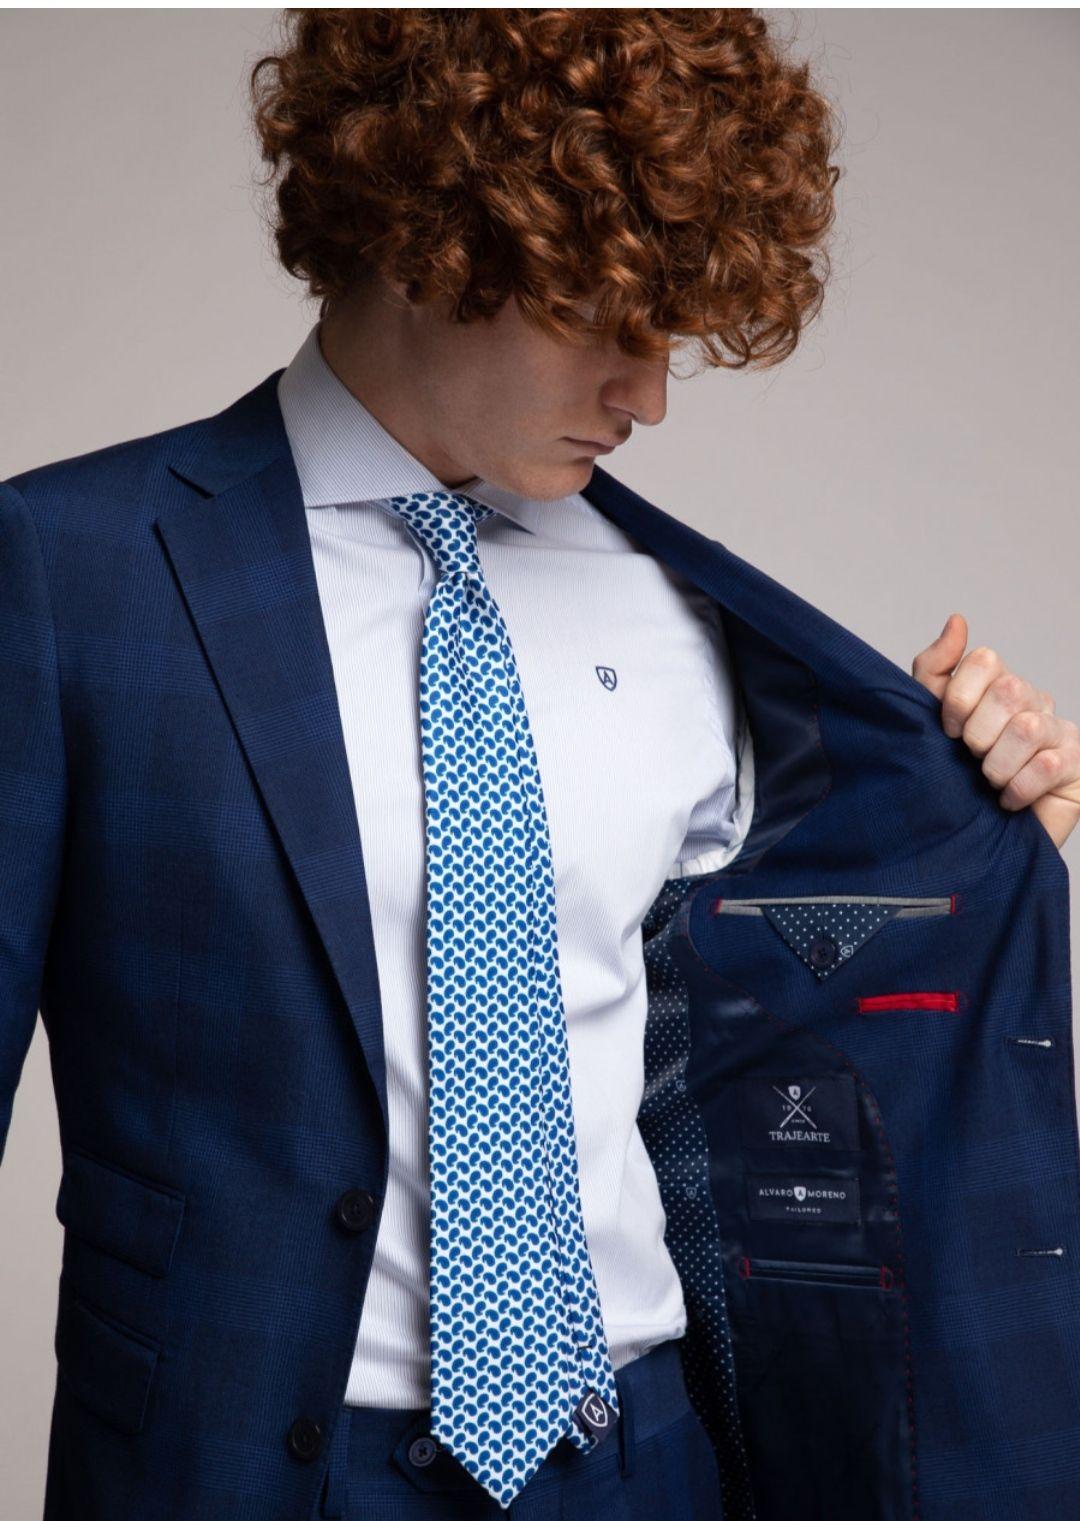 Traje Álvaro Moreno con camisa, corbata y pañuelo por 100€